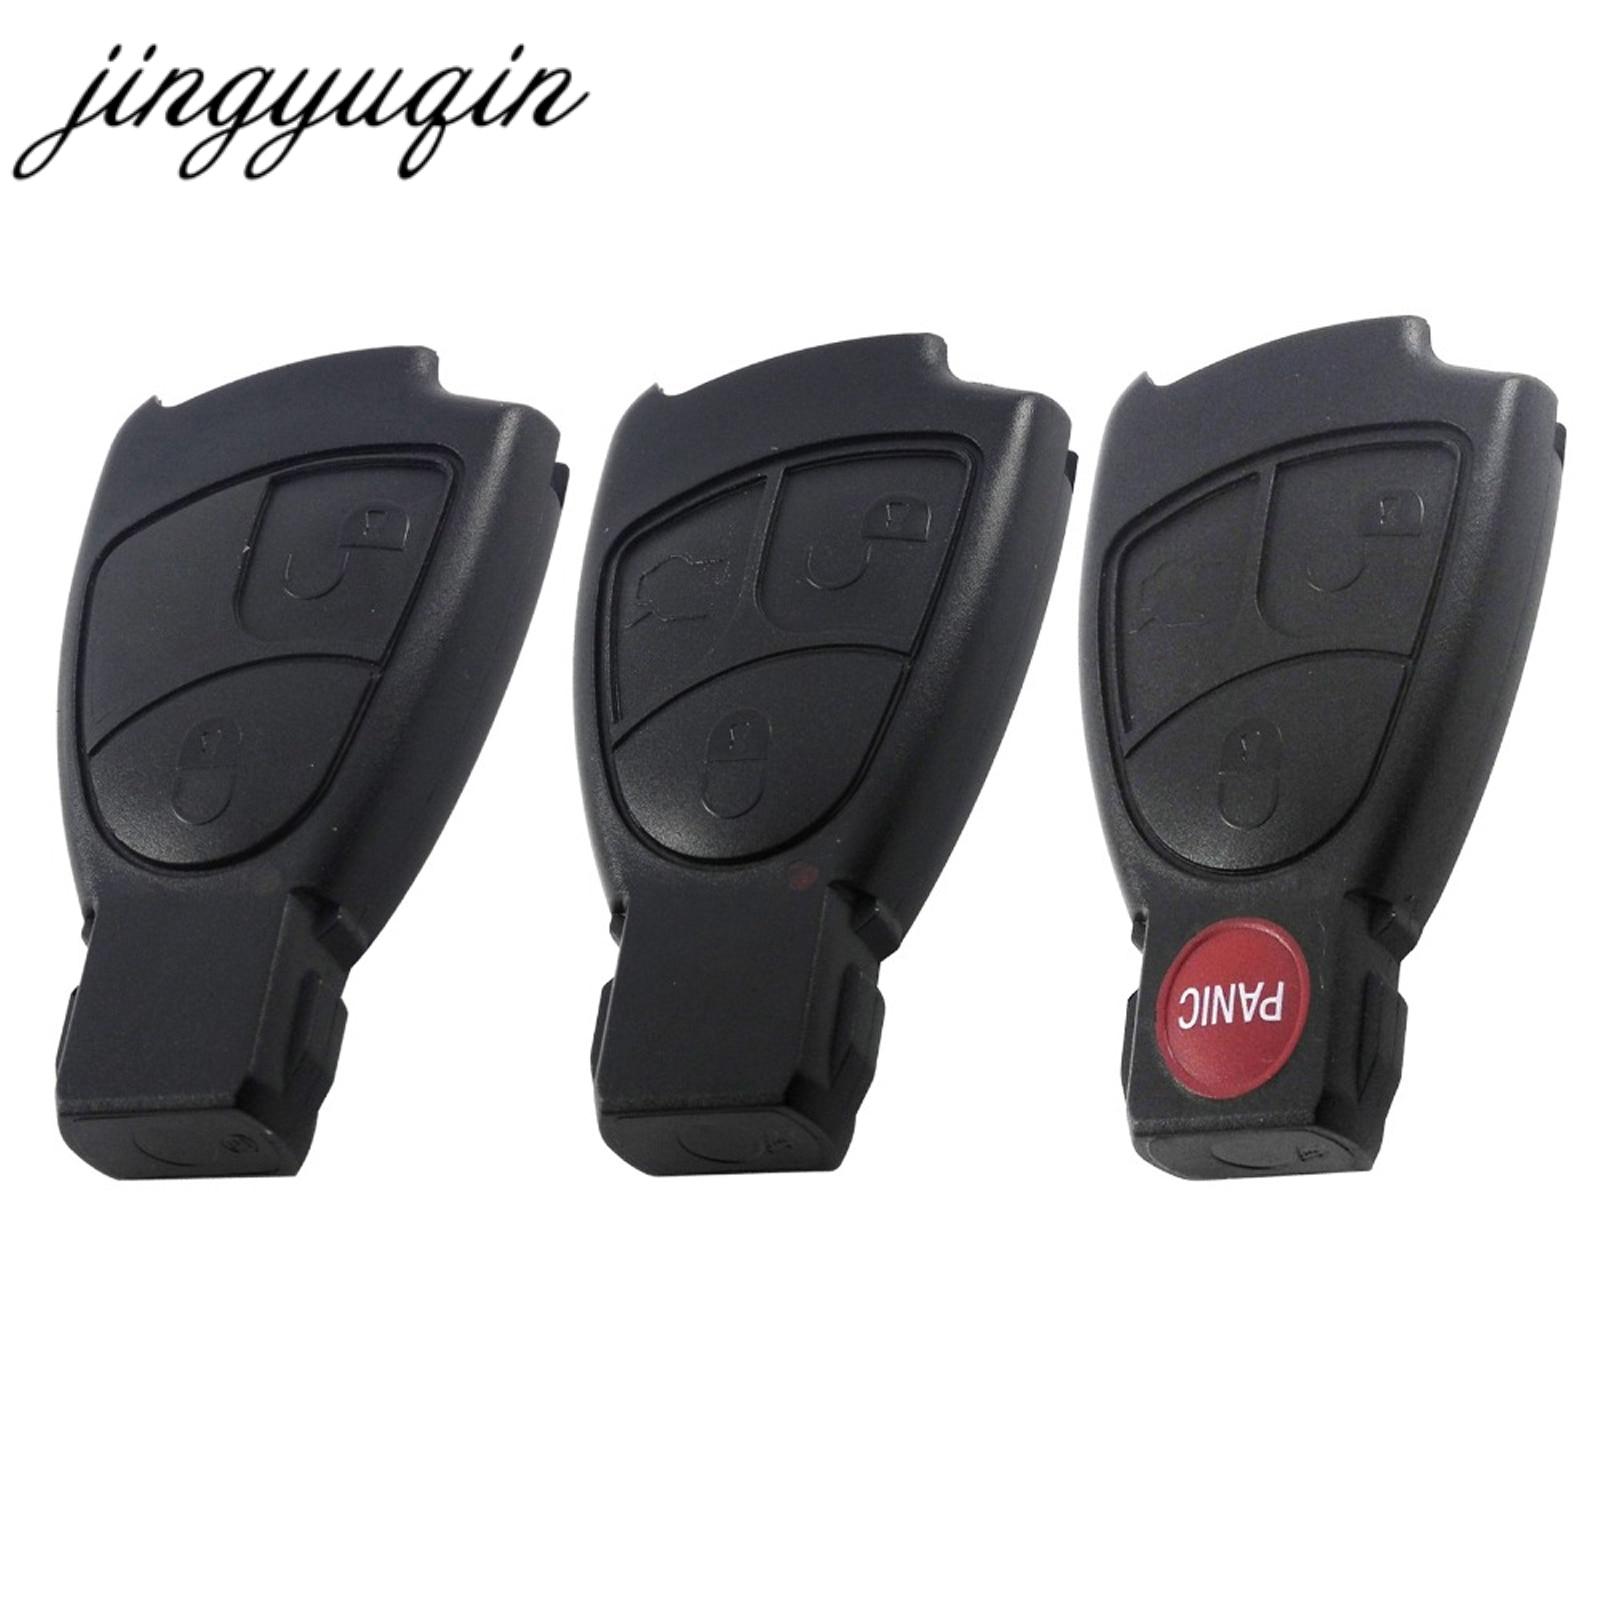 Jingyuqin 100 pçs/lote 2/3/4 botões remoto chave fob caso capa para mercedes benz b c e ml s clk cl 3b 3bt rreplacements